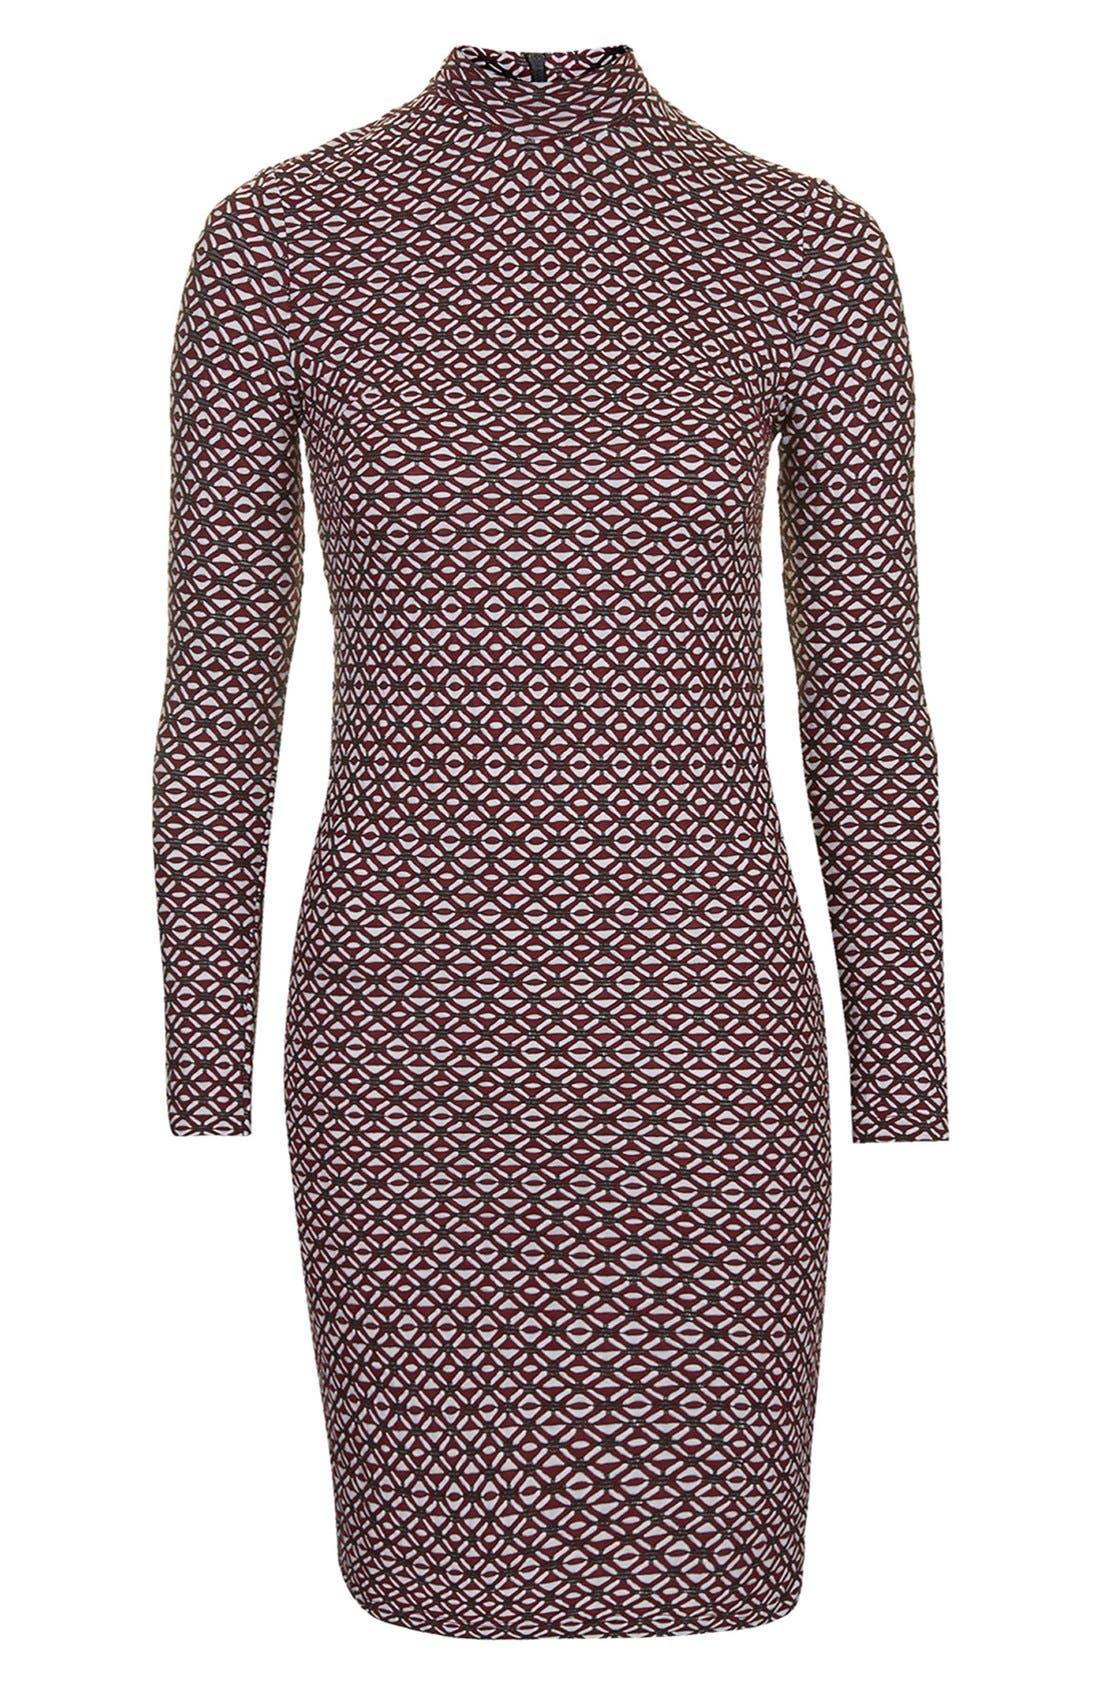 Alternate Image 3  - Topshop Mock Neck Body-Con Dress (Regular & Petite)